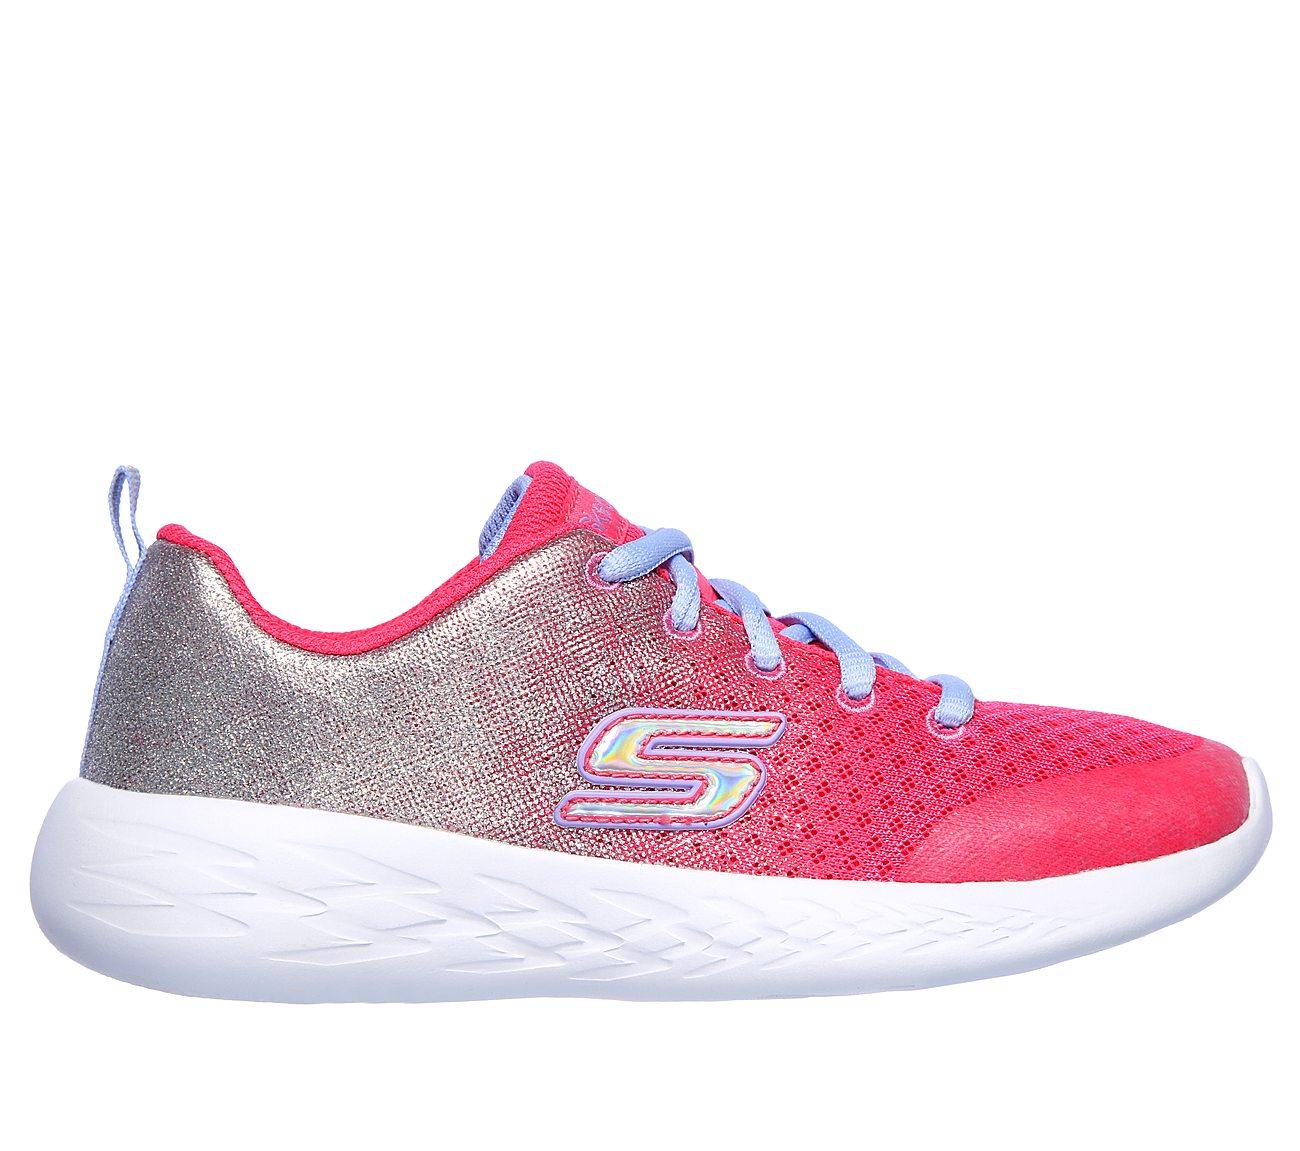 Skechers GOrun 600 - Sparkle Speed